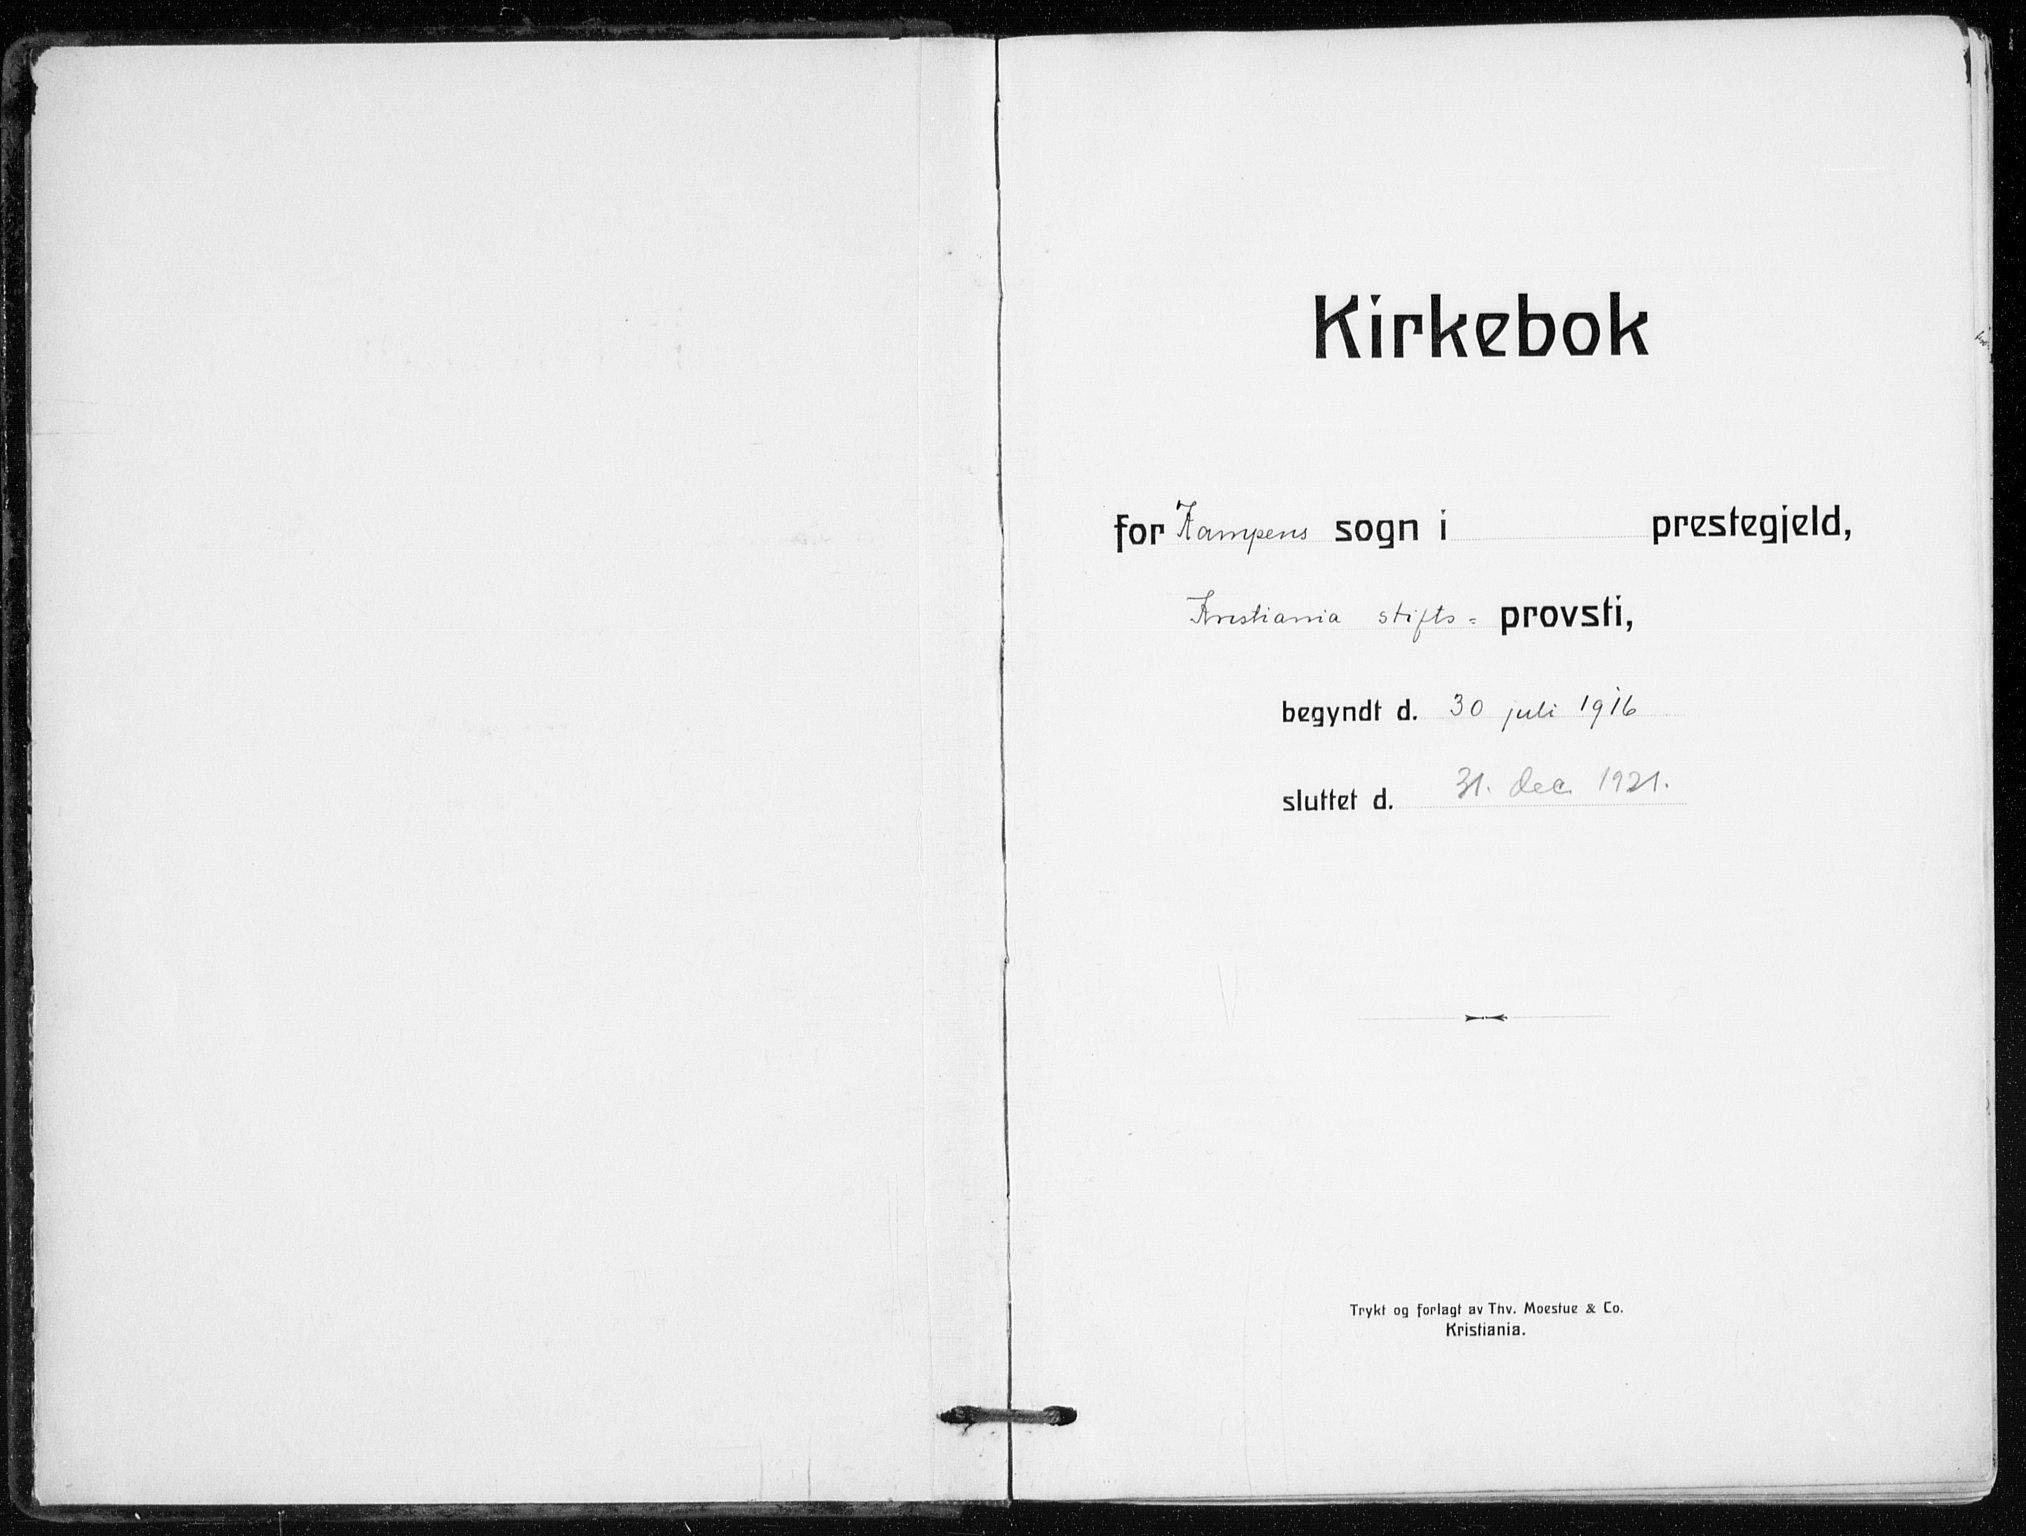 SAO, Kampen prestekontor Kirkebøker, F/Fa/L0012: Ministerialbok nr. I 12, 1916-1921